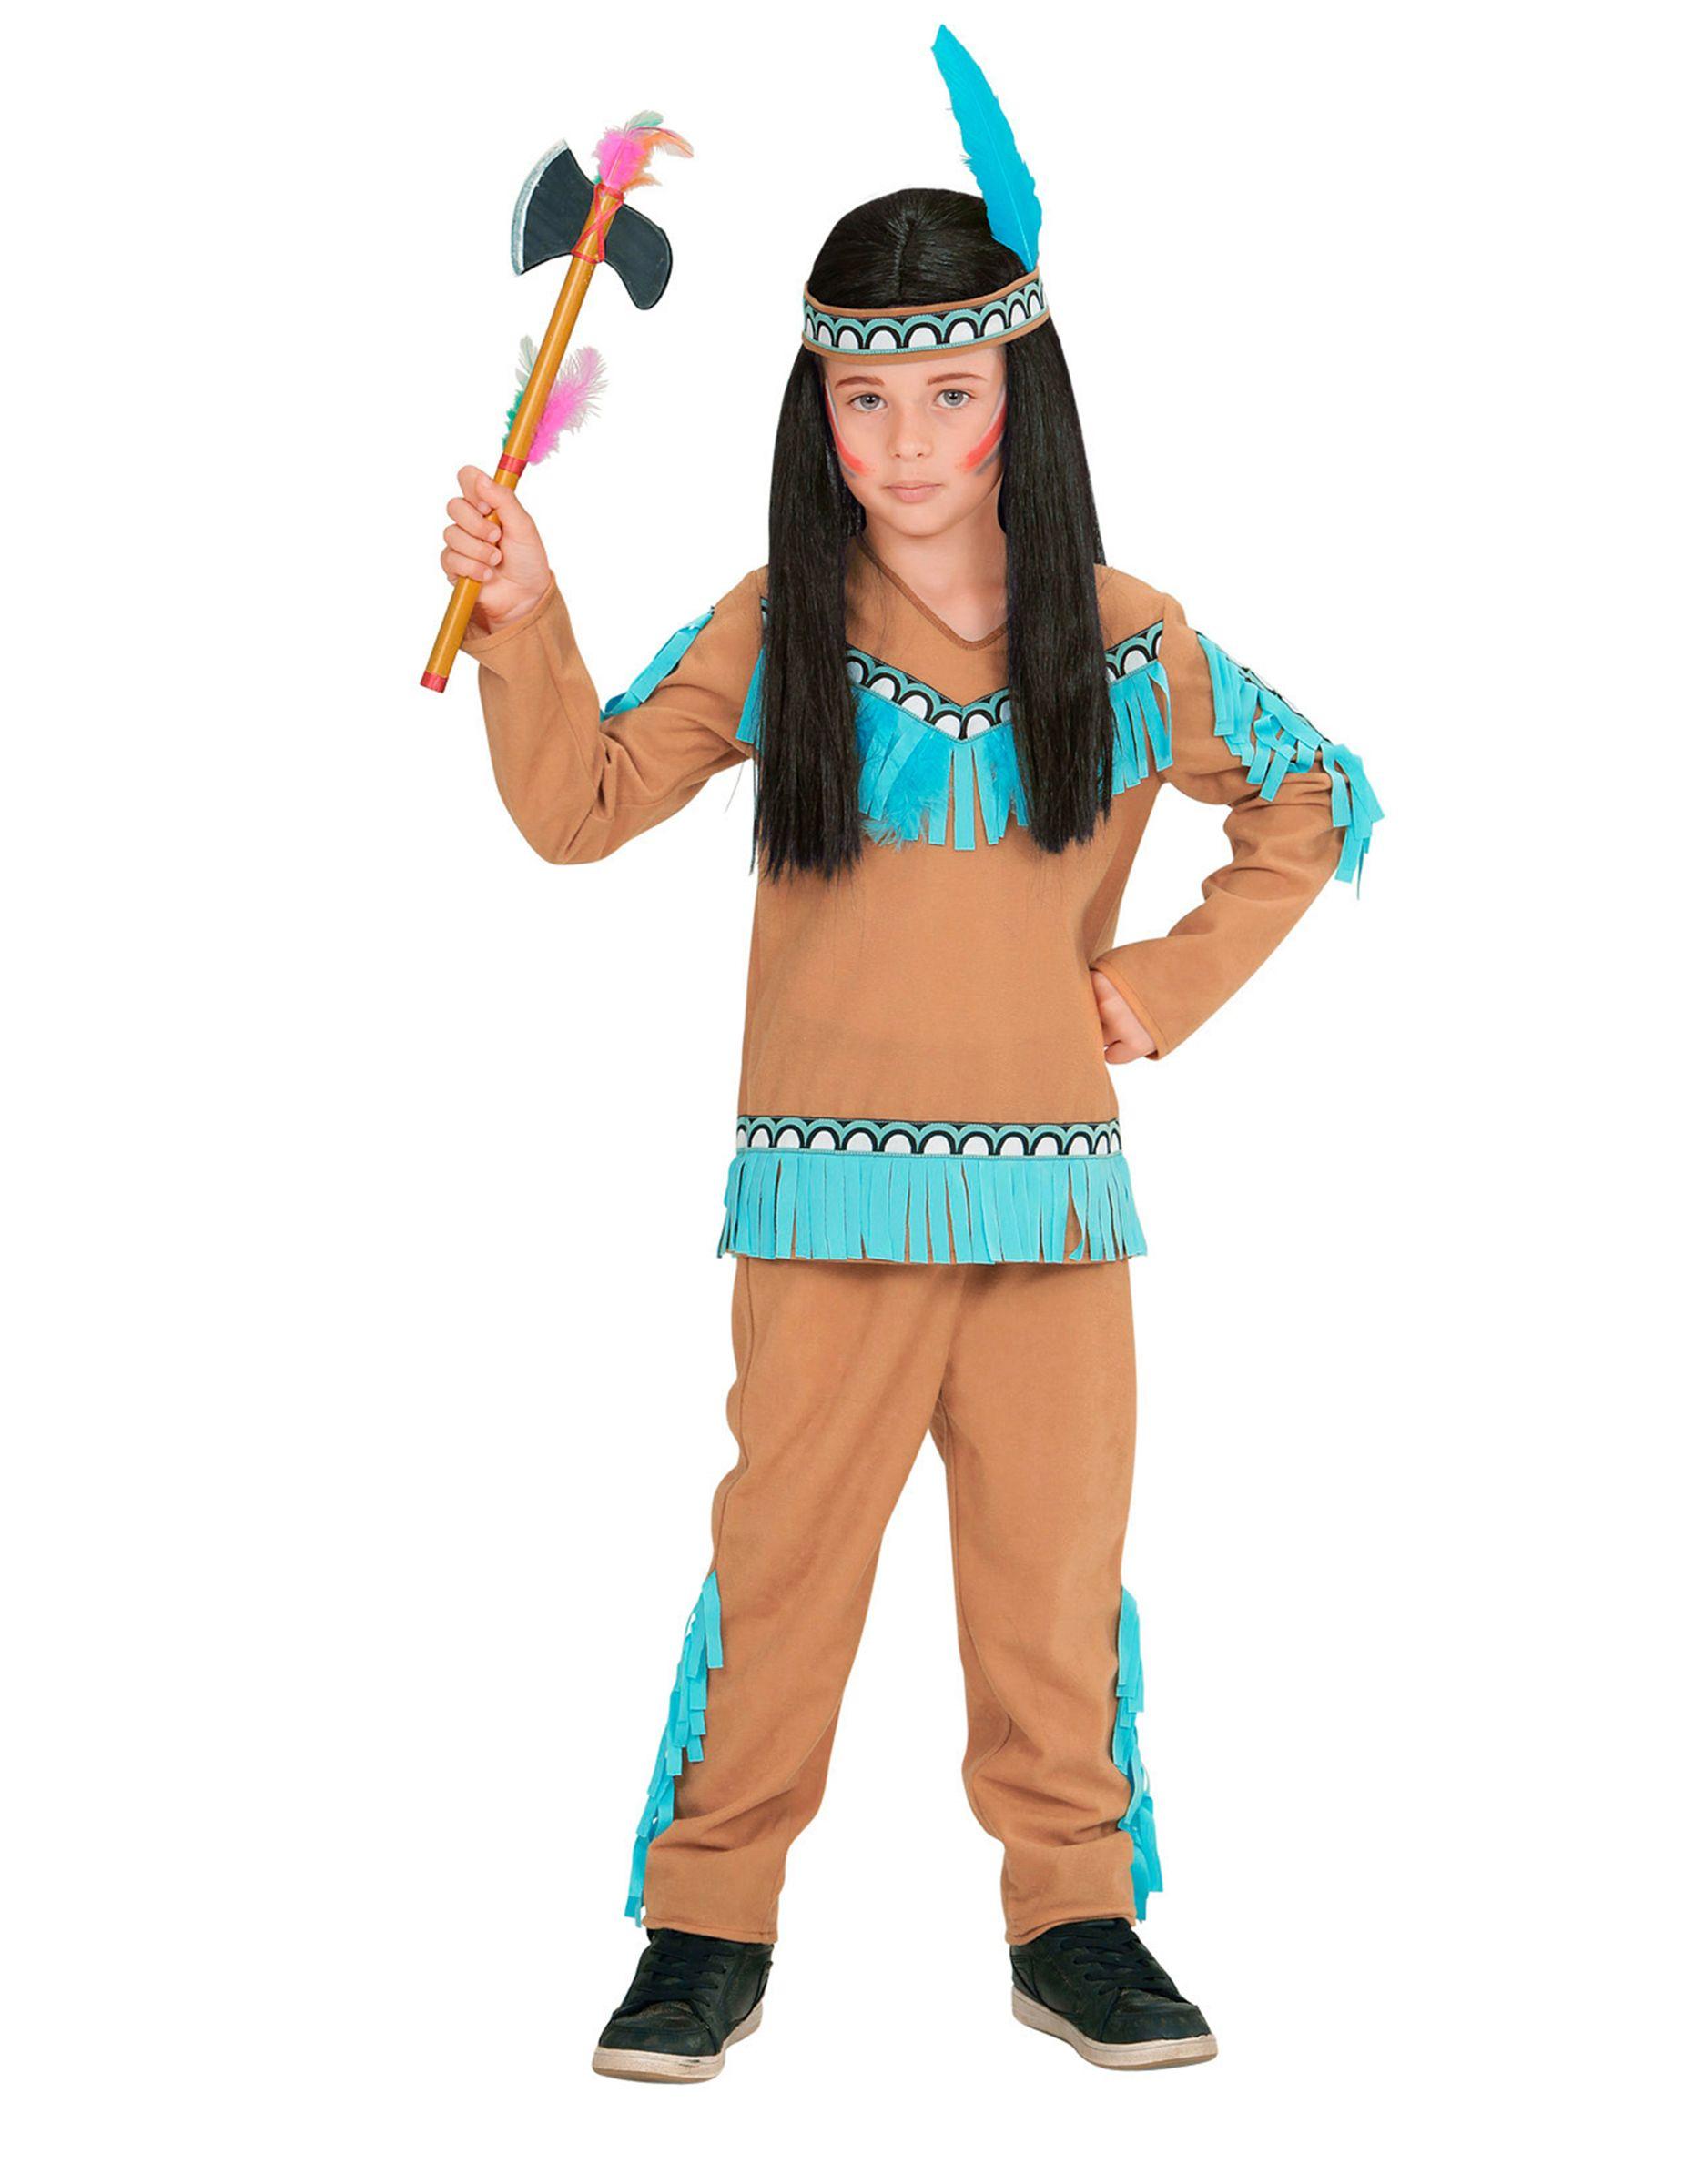 Camicia INDIANI INDIANI Costume Bambini Carnevale